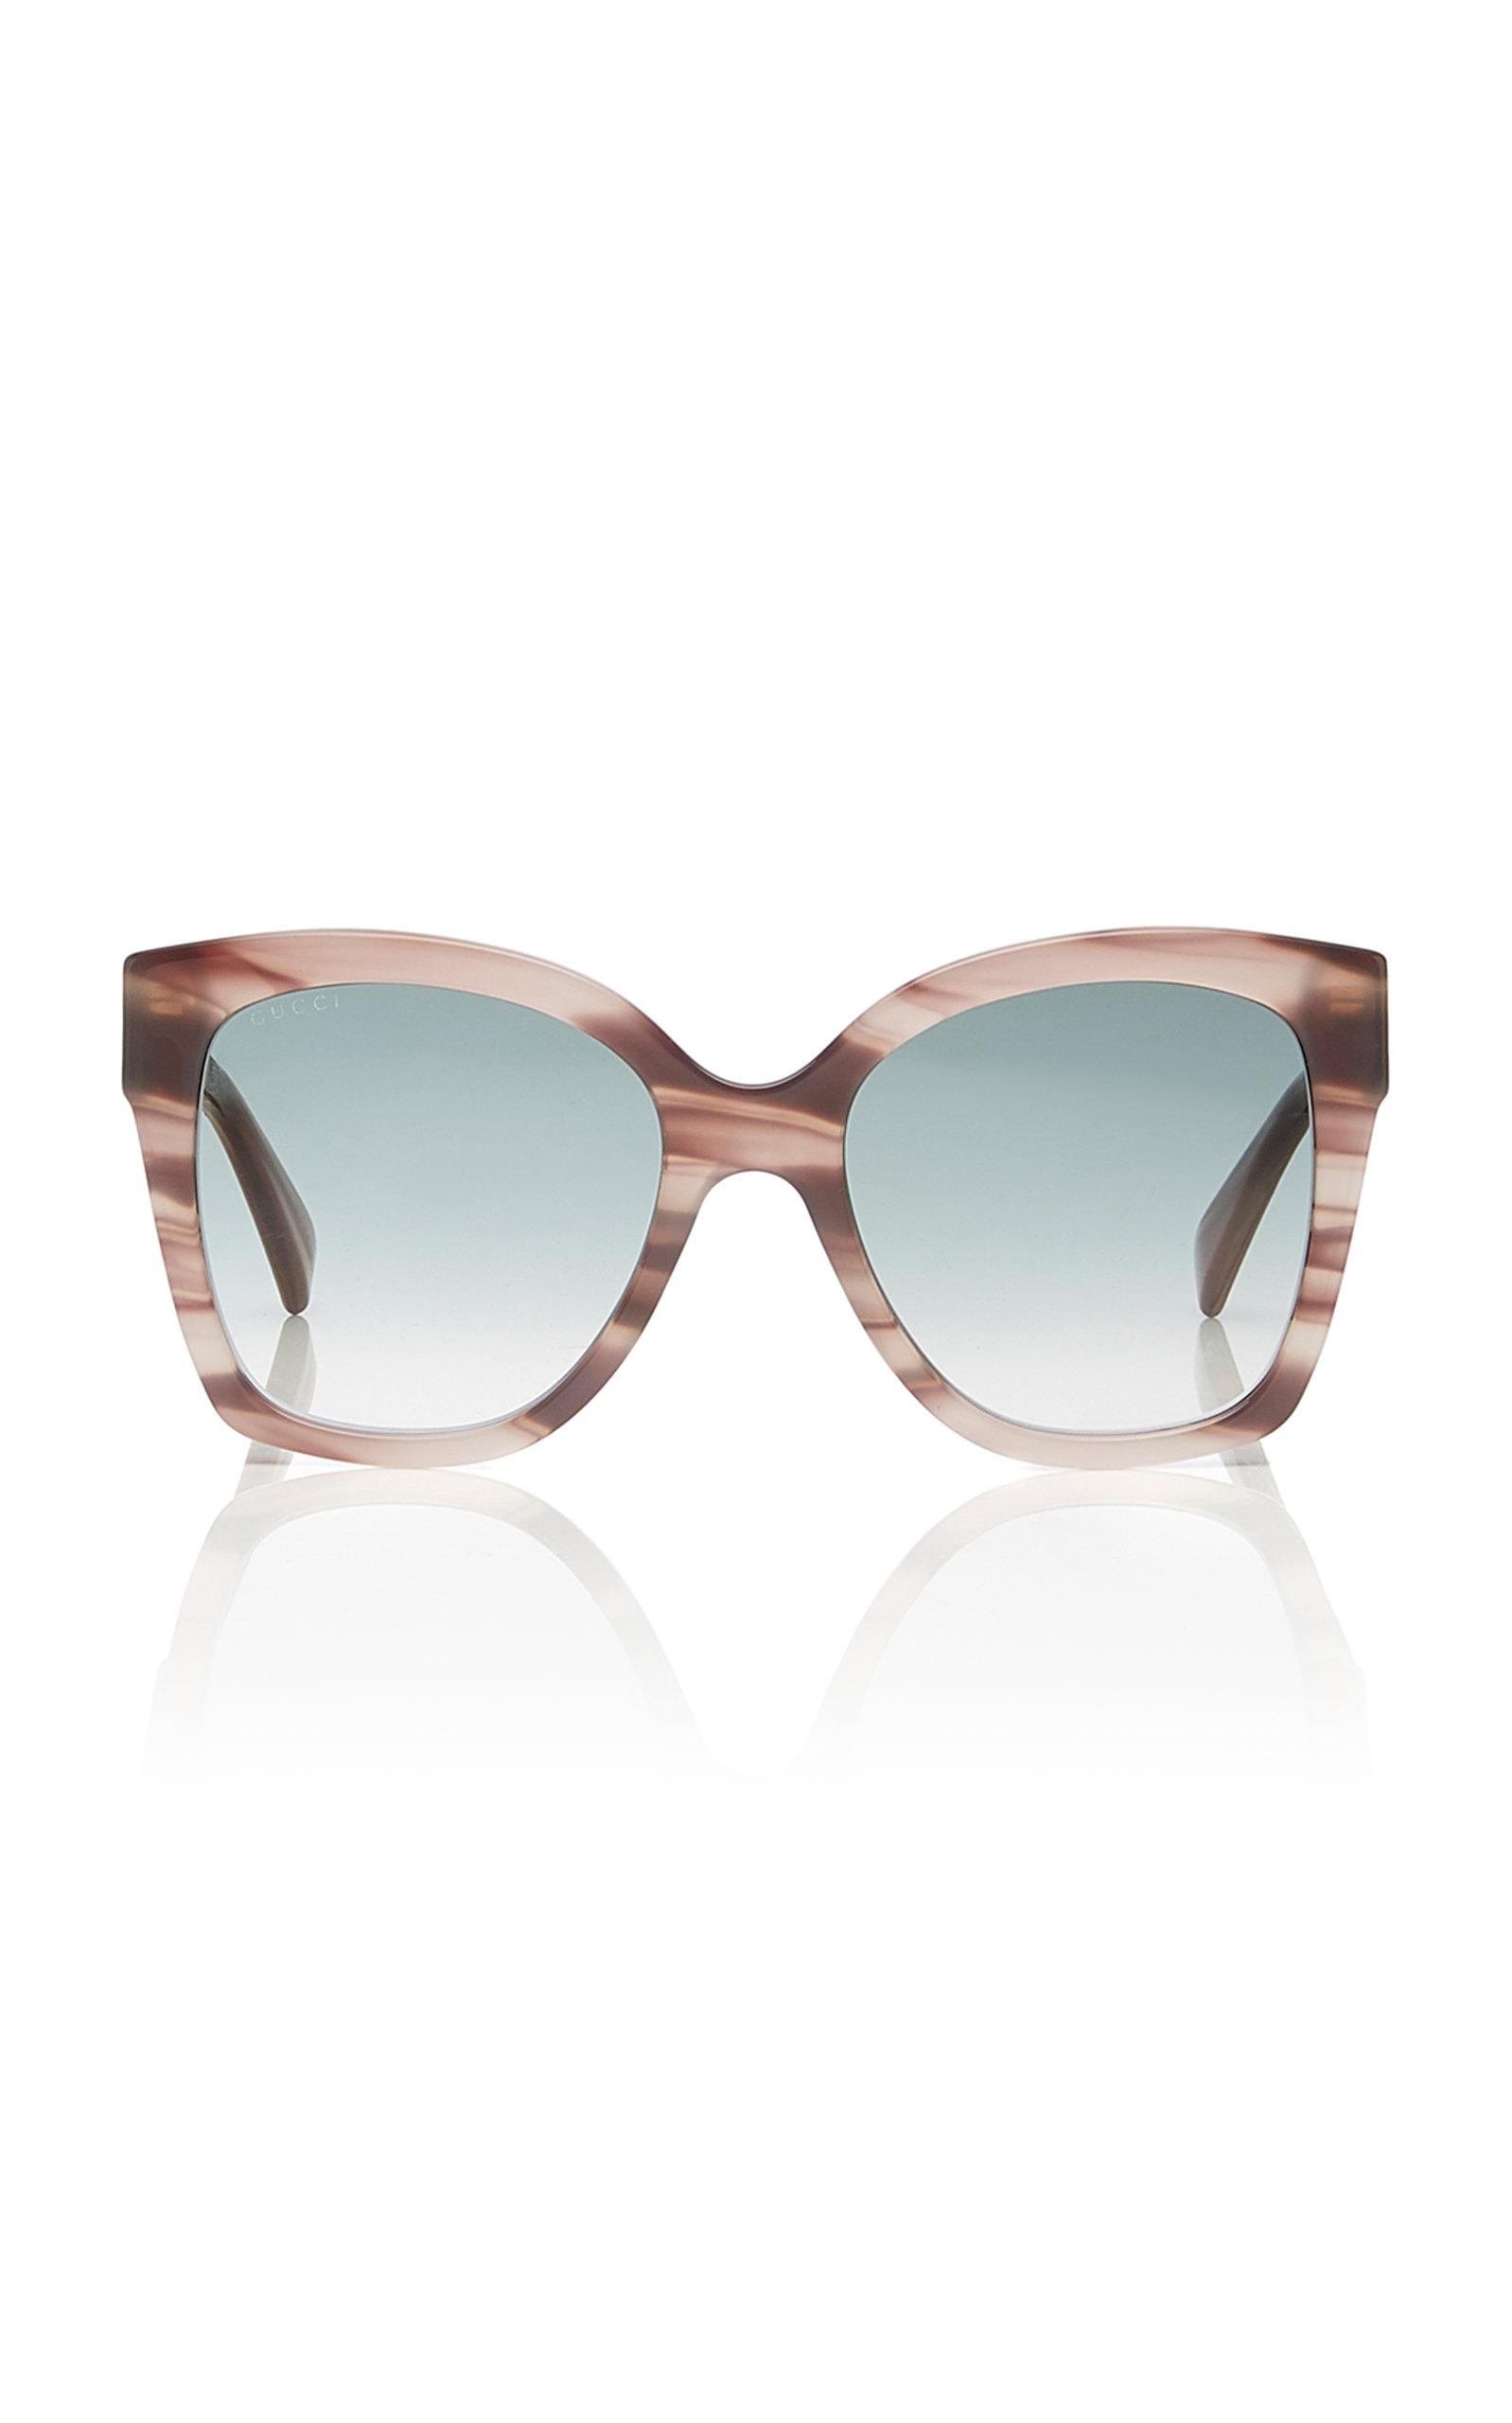 812d40731bc Gucci Sunglasses Marbled Acetate Square-Frame Sunglasses. CLOSE. Loading